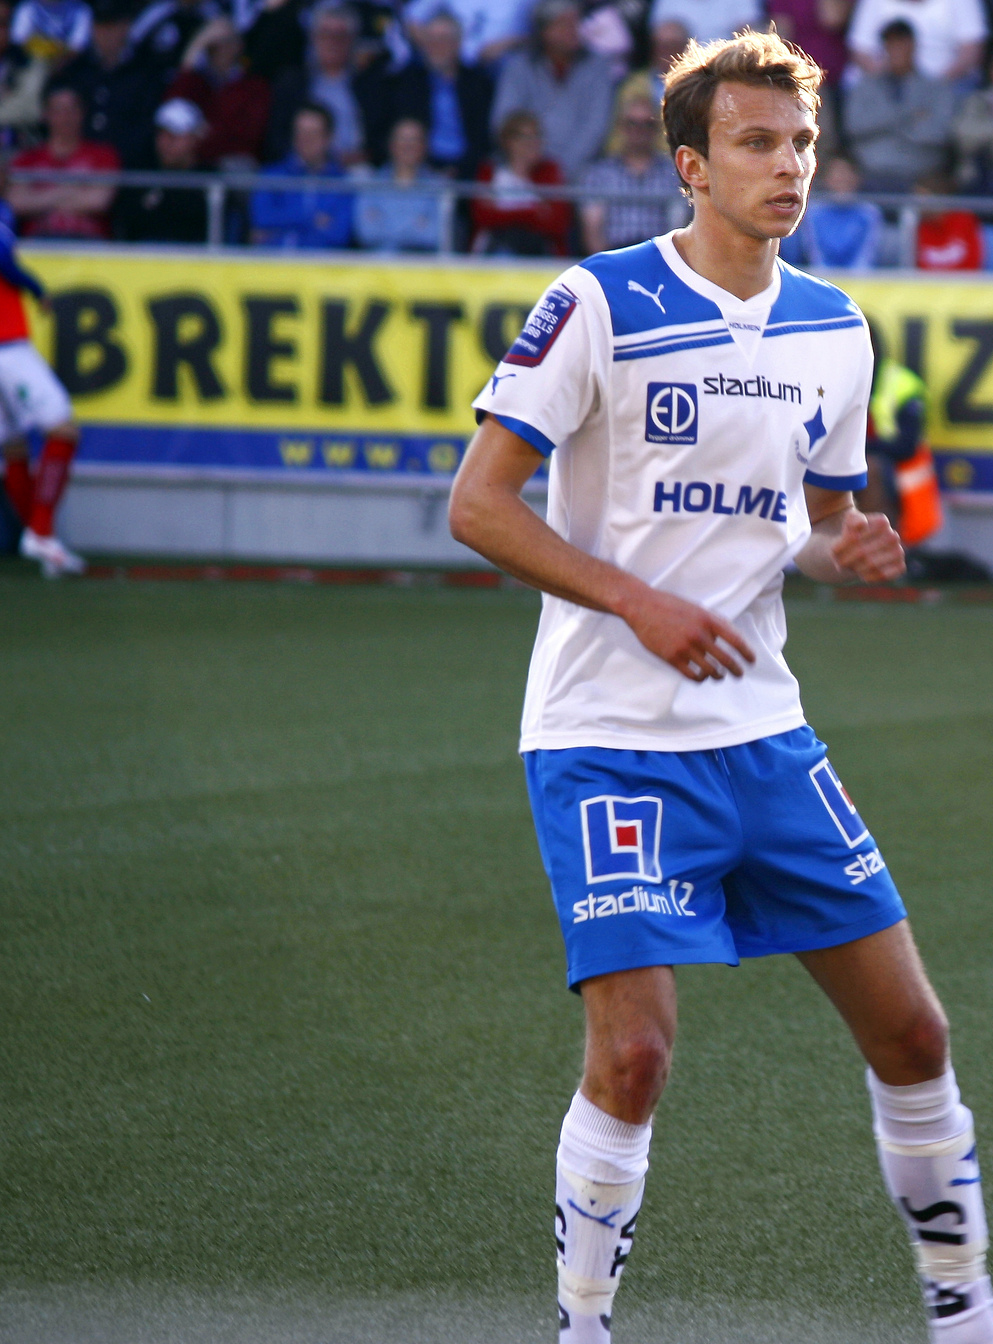 Lars Krogh Gerson –